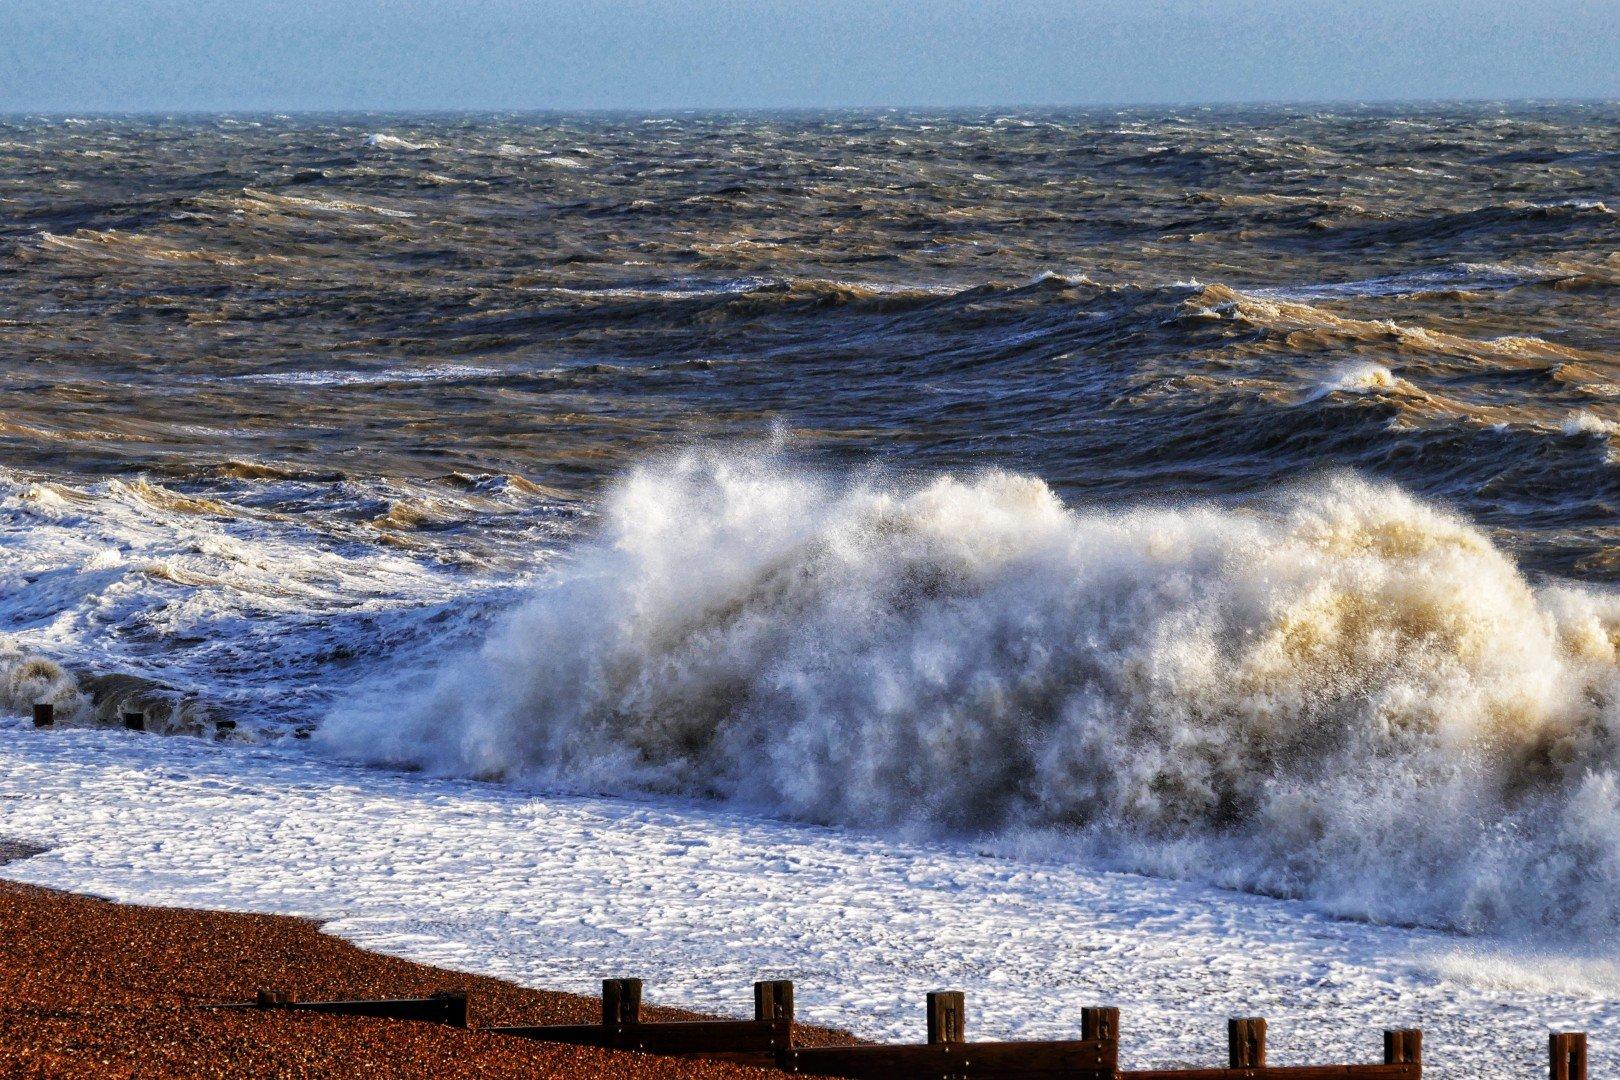 Rough Seas at St Leonards Beach